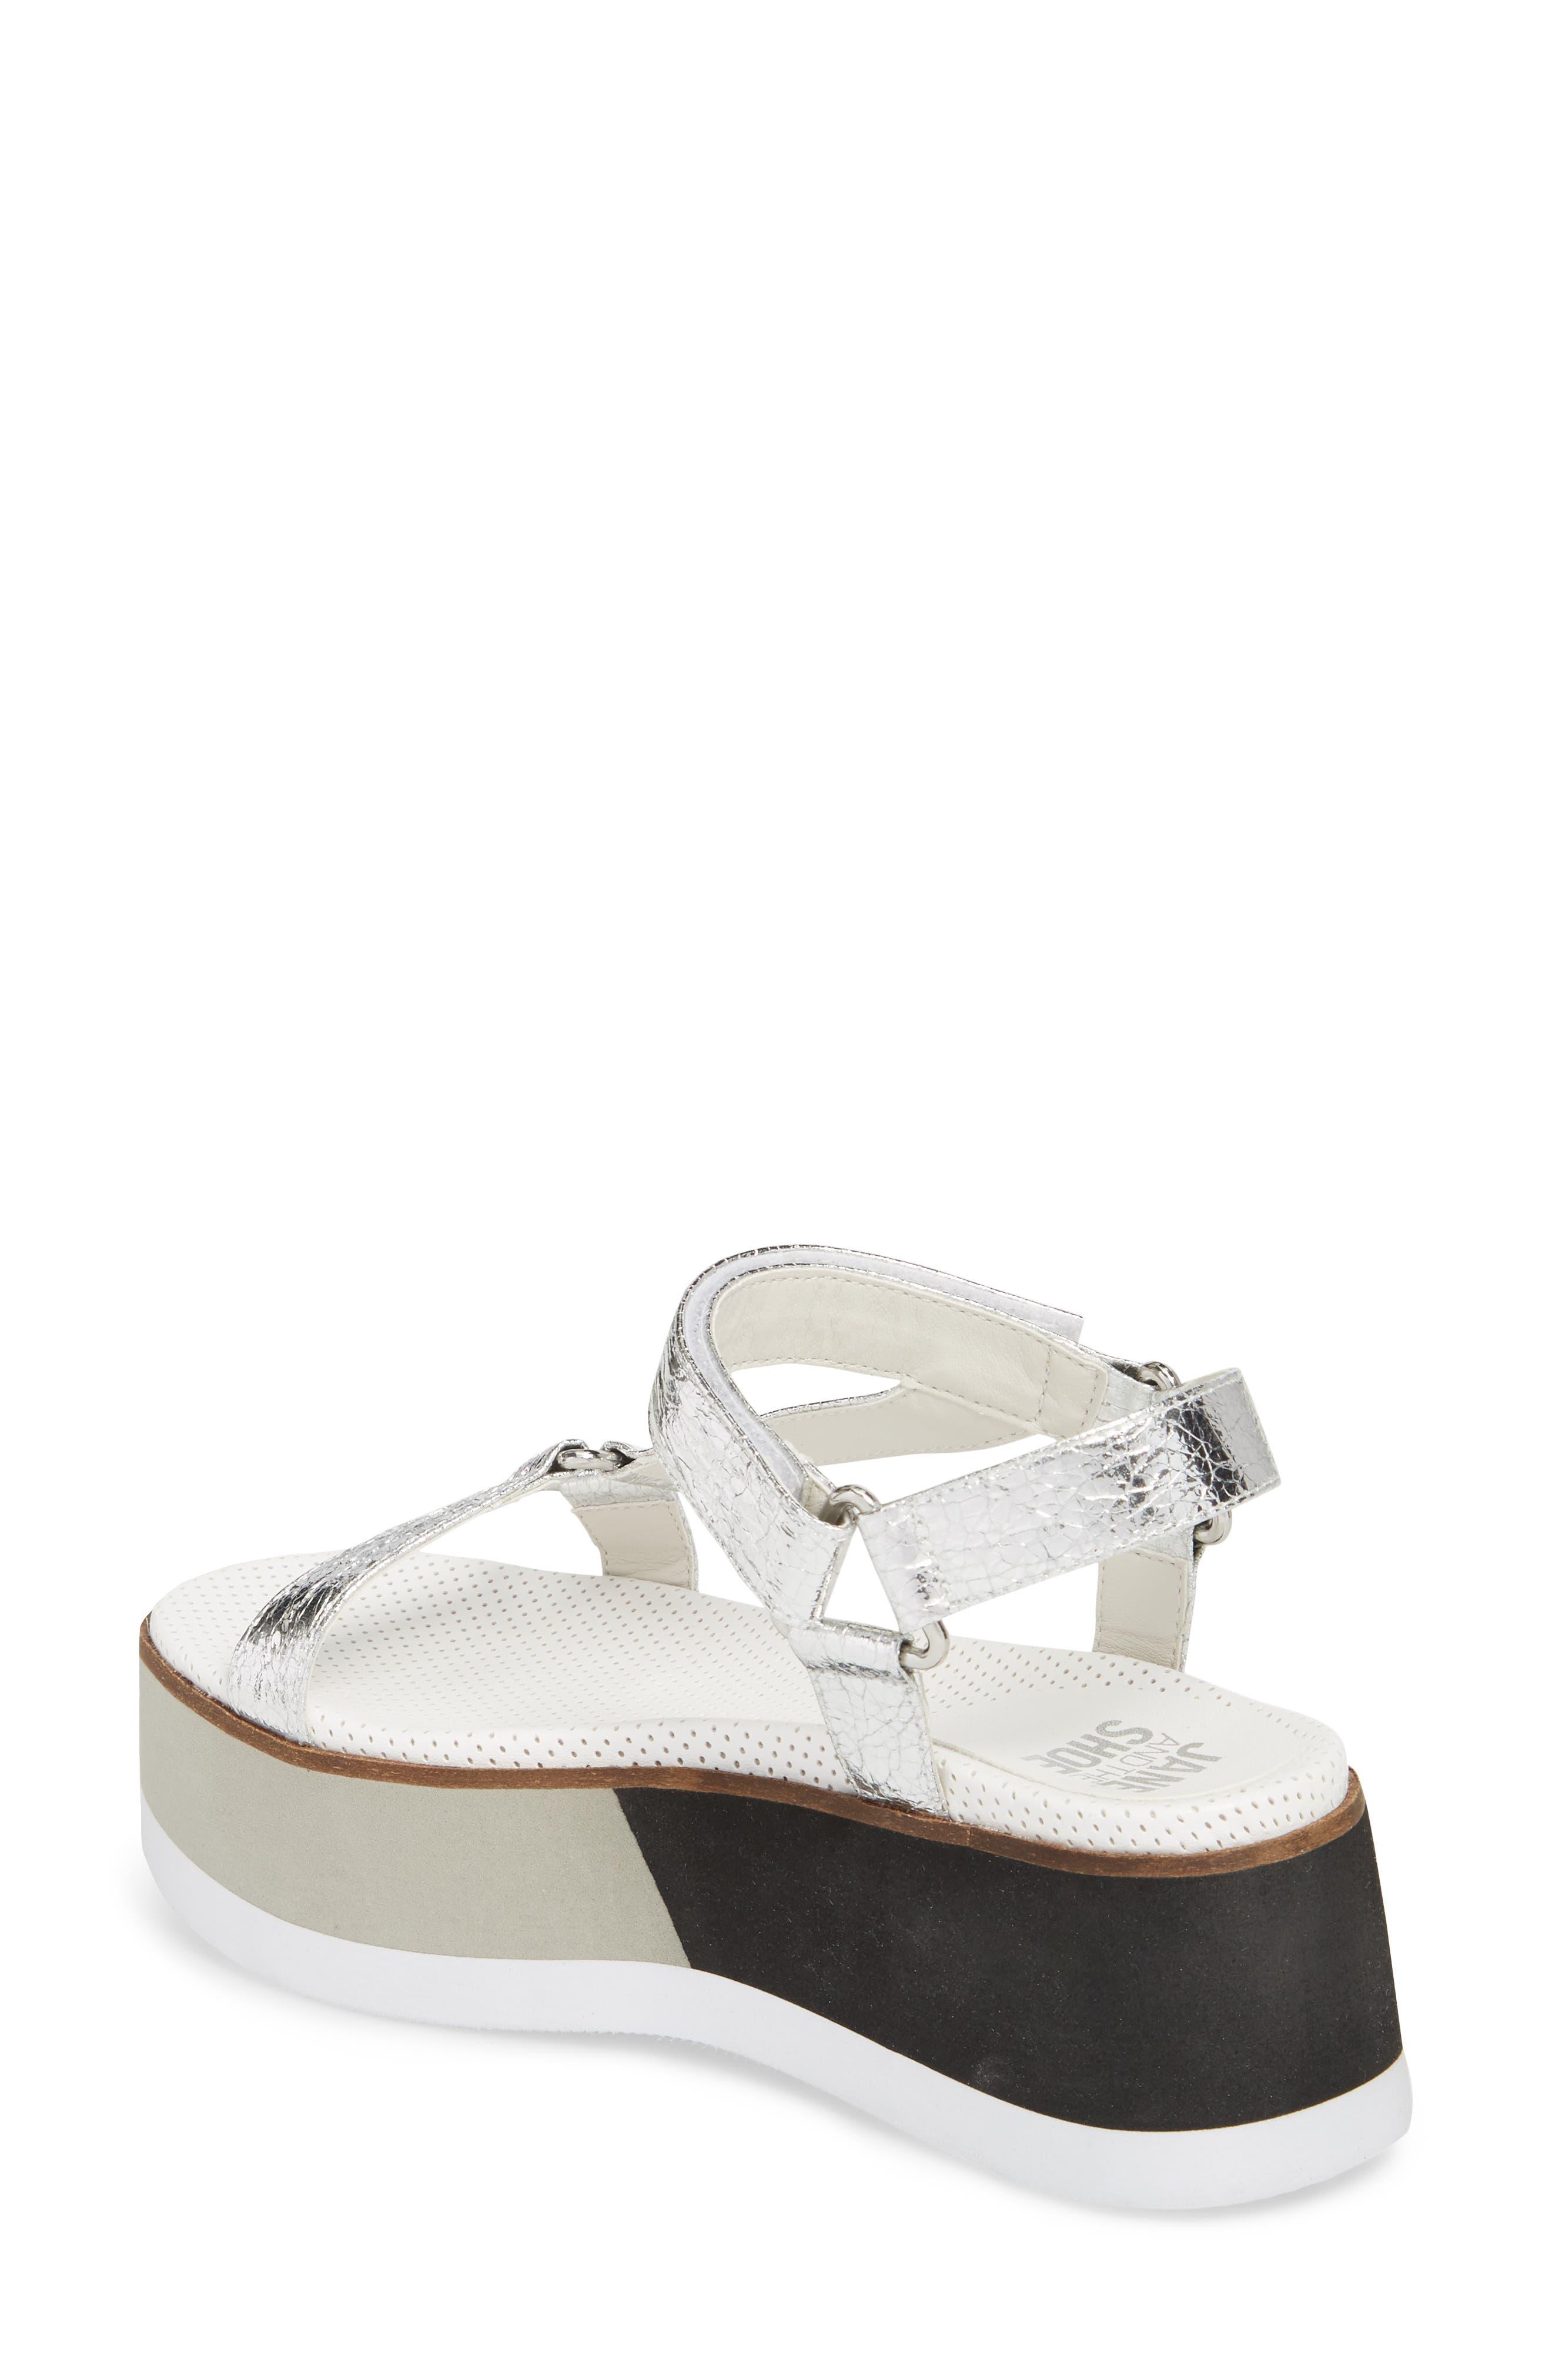 Jayden Platform Sport Sandal,                             Alternate thumbnail 2, color,                             Silver